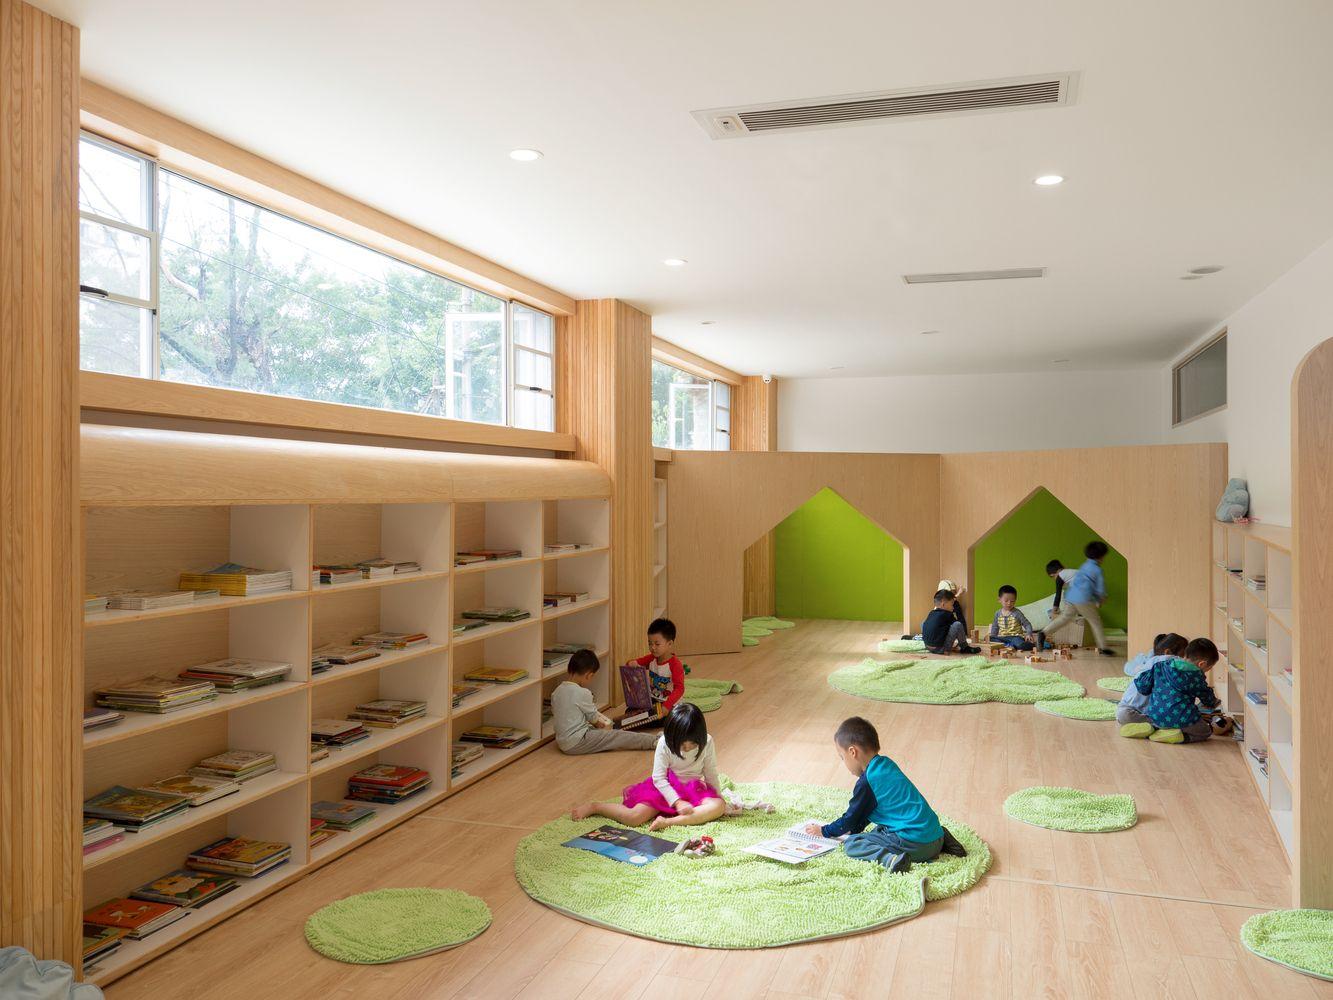 Gallery Of Lion International Kindergarten Vmdpe 15 Modern Kids Room Design Modern Kids Room Kids Room Design